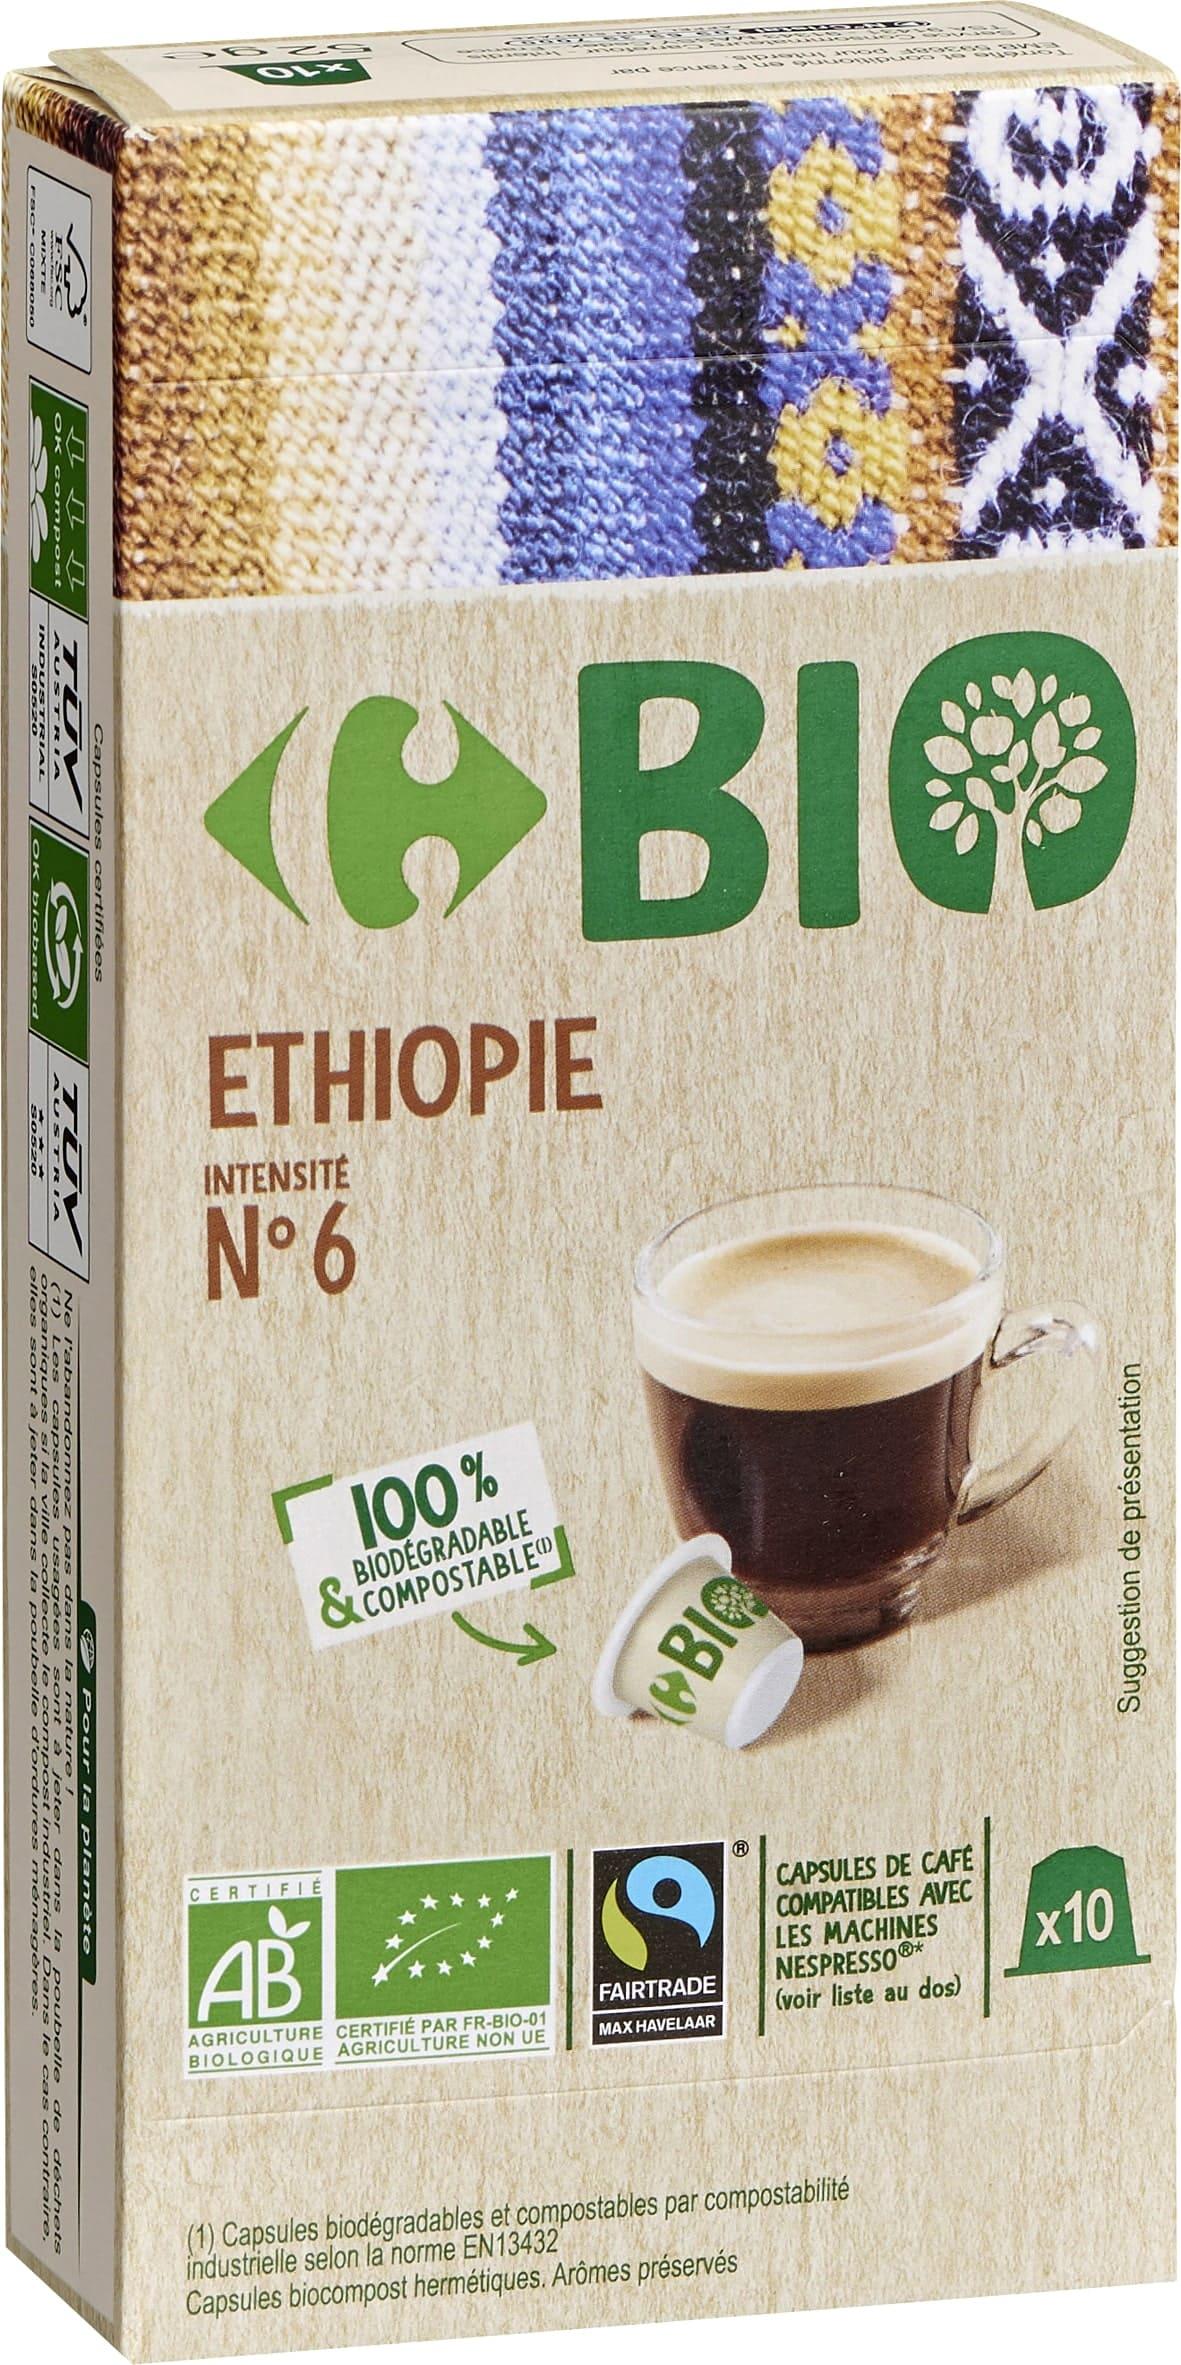 Capsules de cafe type nespresso compostable BIo degradable ETHIOPIE